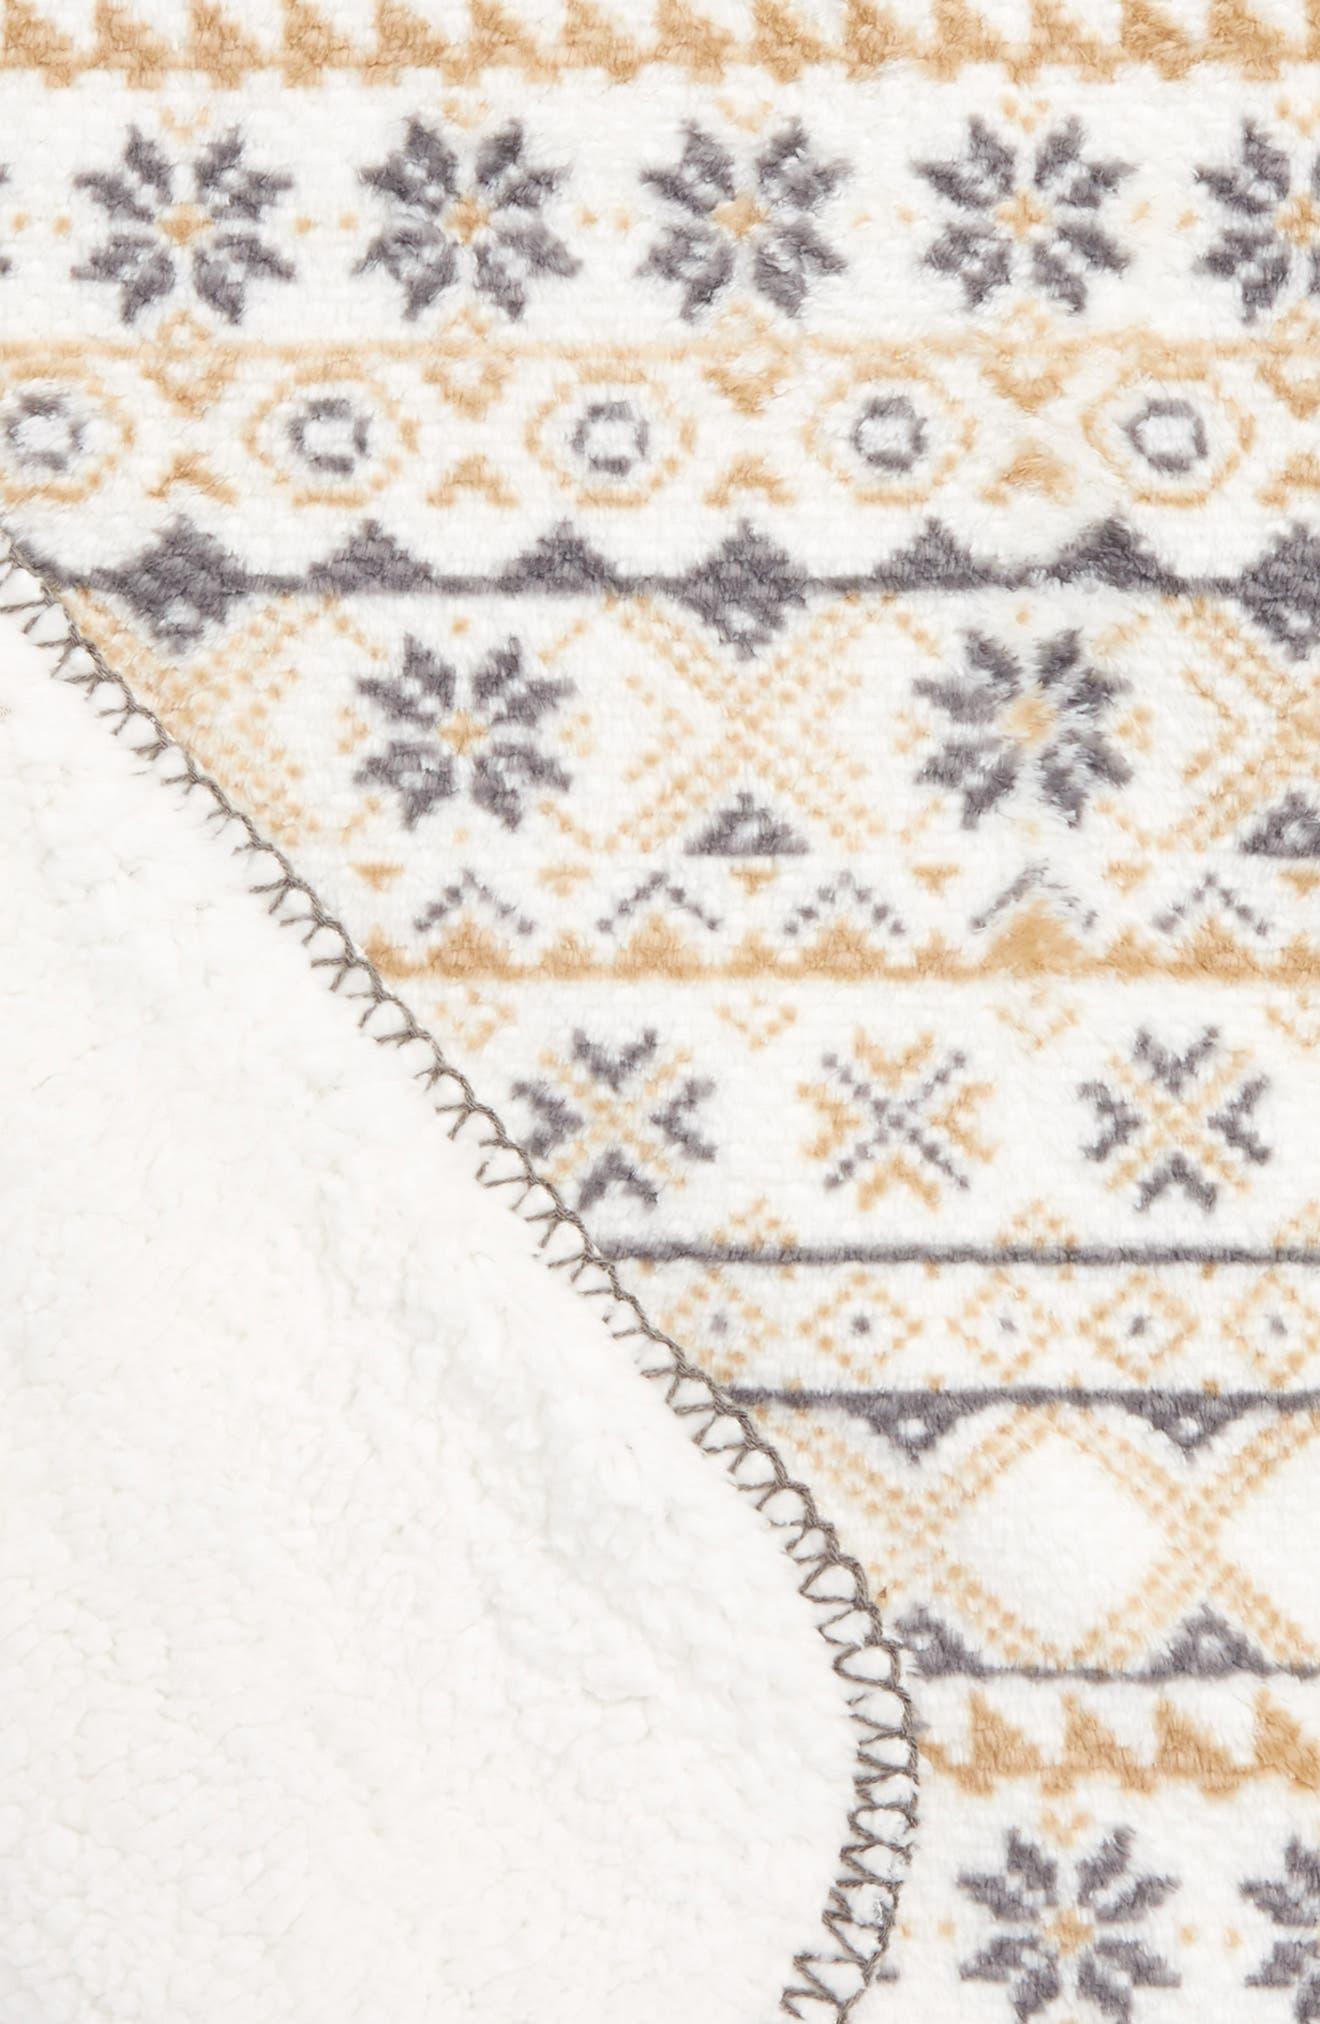 Fair Isle Print Faux Shearling Blanket,                             Alternate thumbnail 2, color,                             900